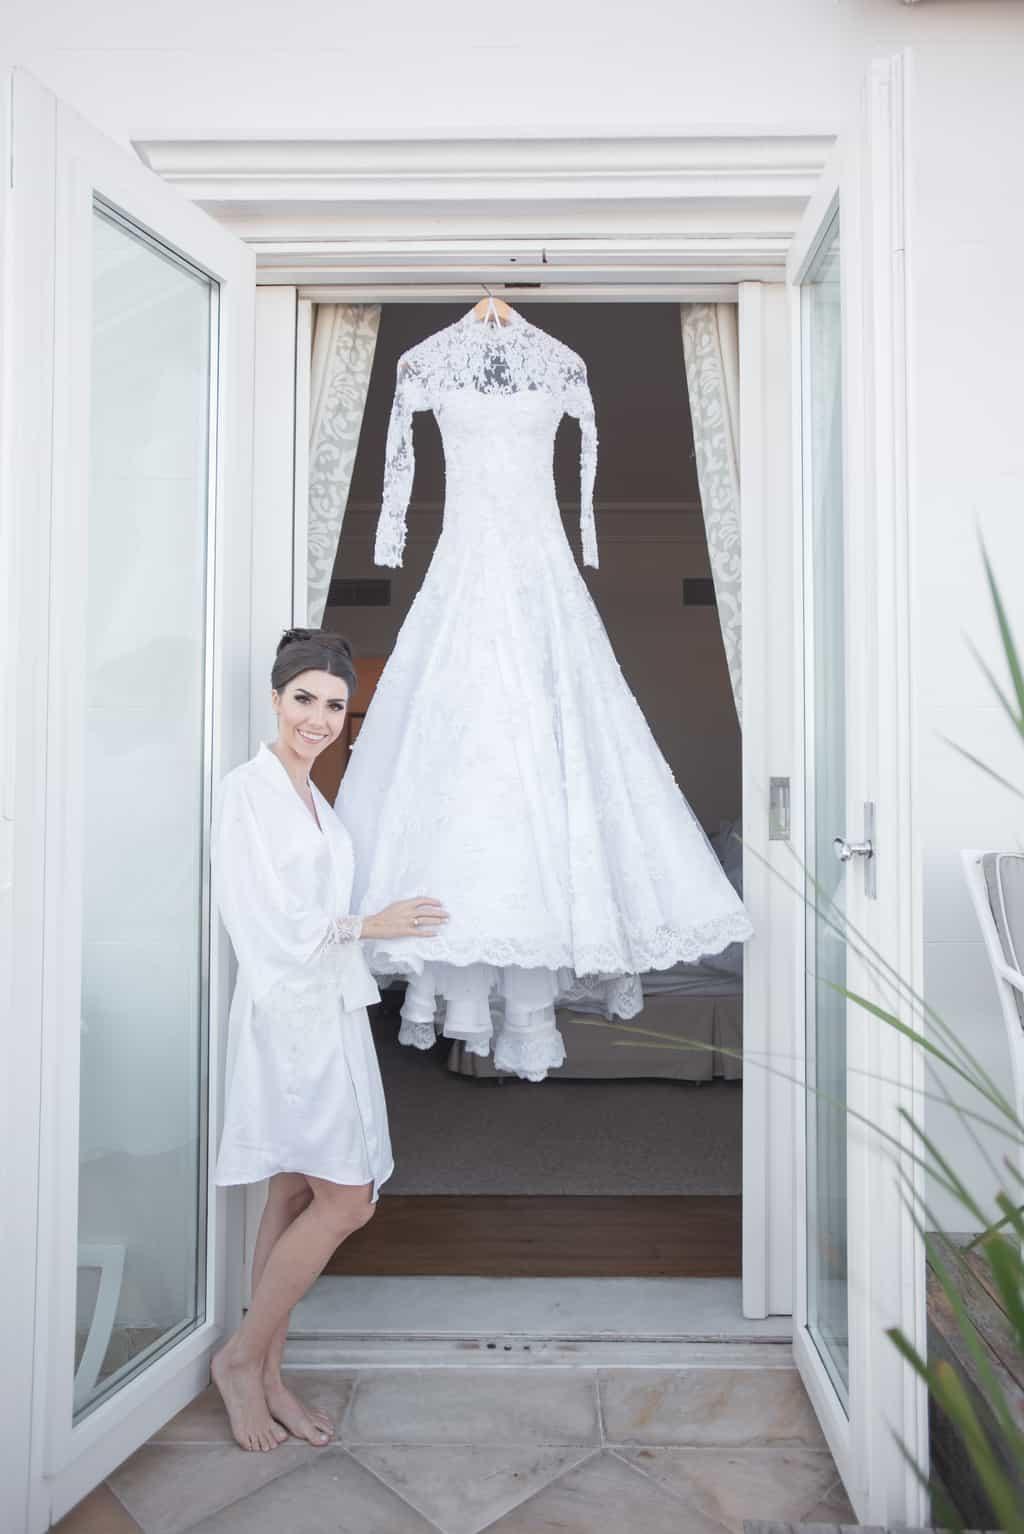 casamento-Patricia-e-Thiago-Copacabana-Palace-Marcelo-Hicho-Paula-Rocha-Marina-Fava-Making-Of0115-Patricia-e-Thiago-WAL_2601